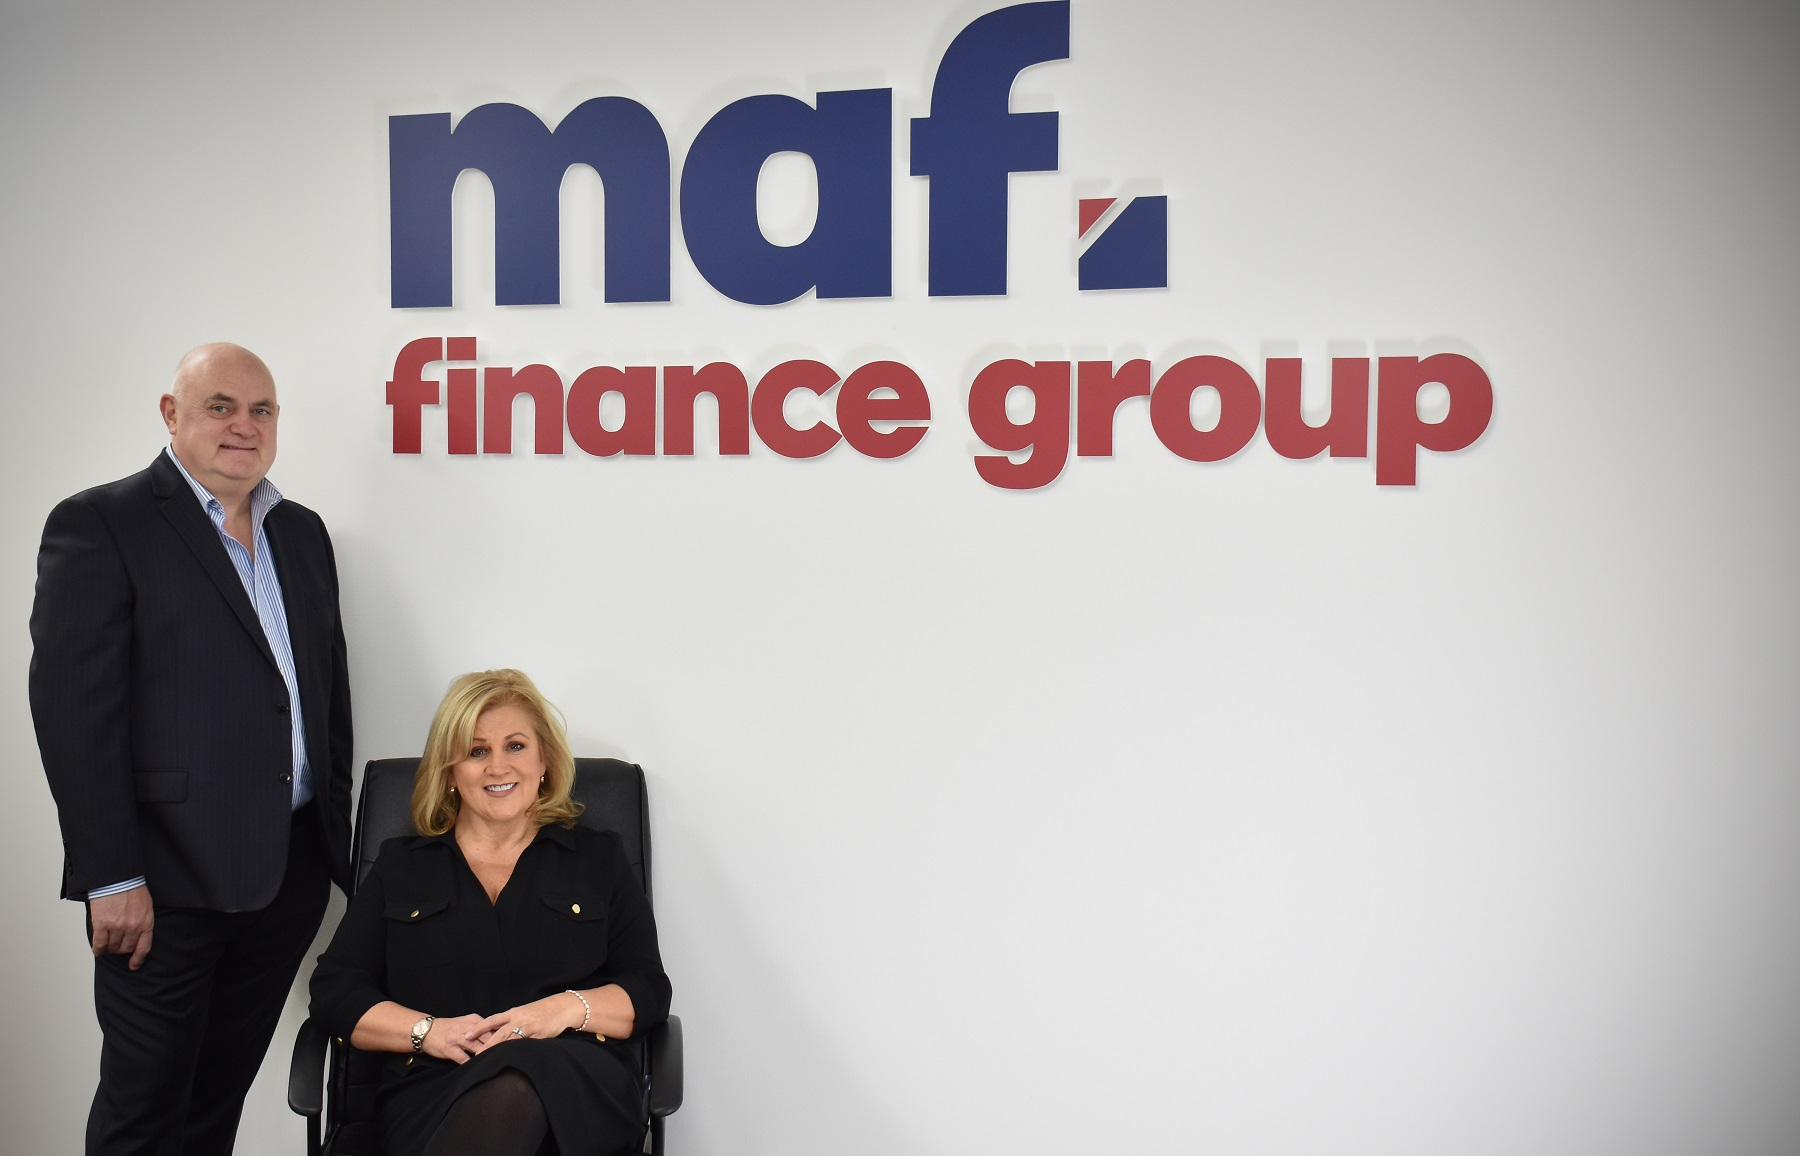 National finance broker reveals company rebrand